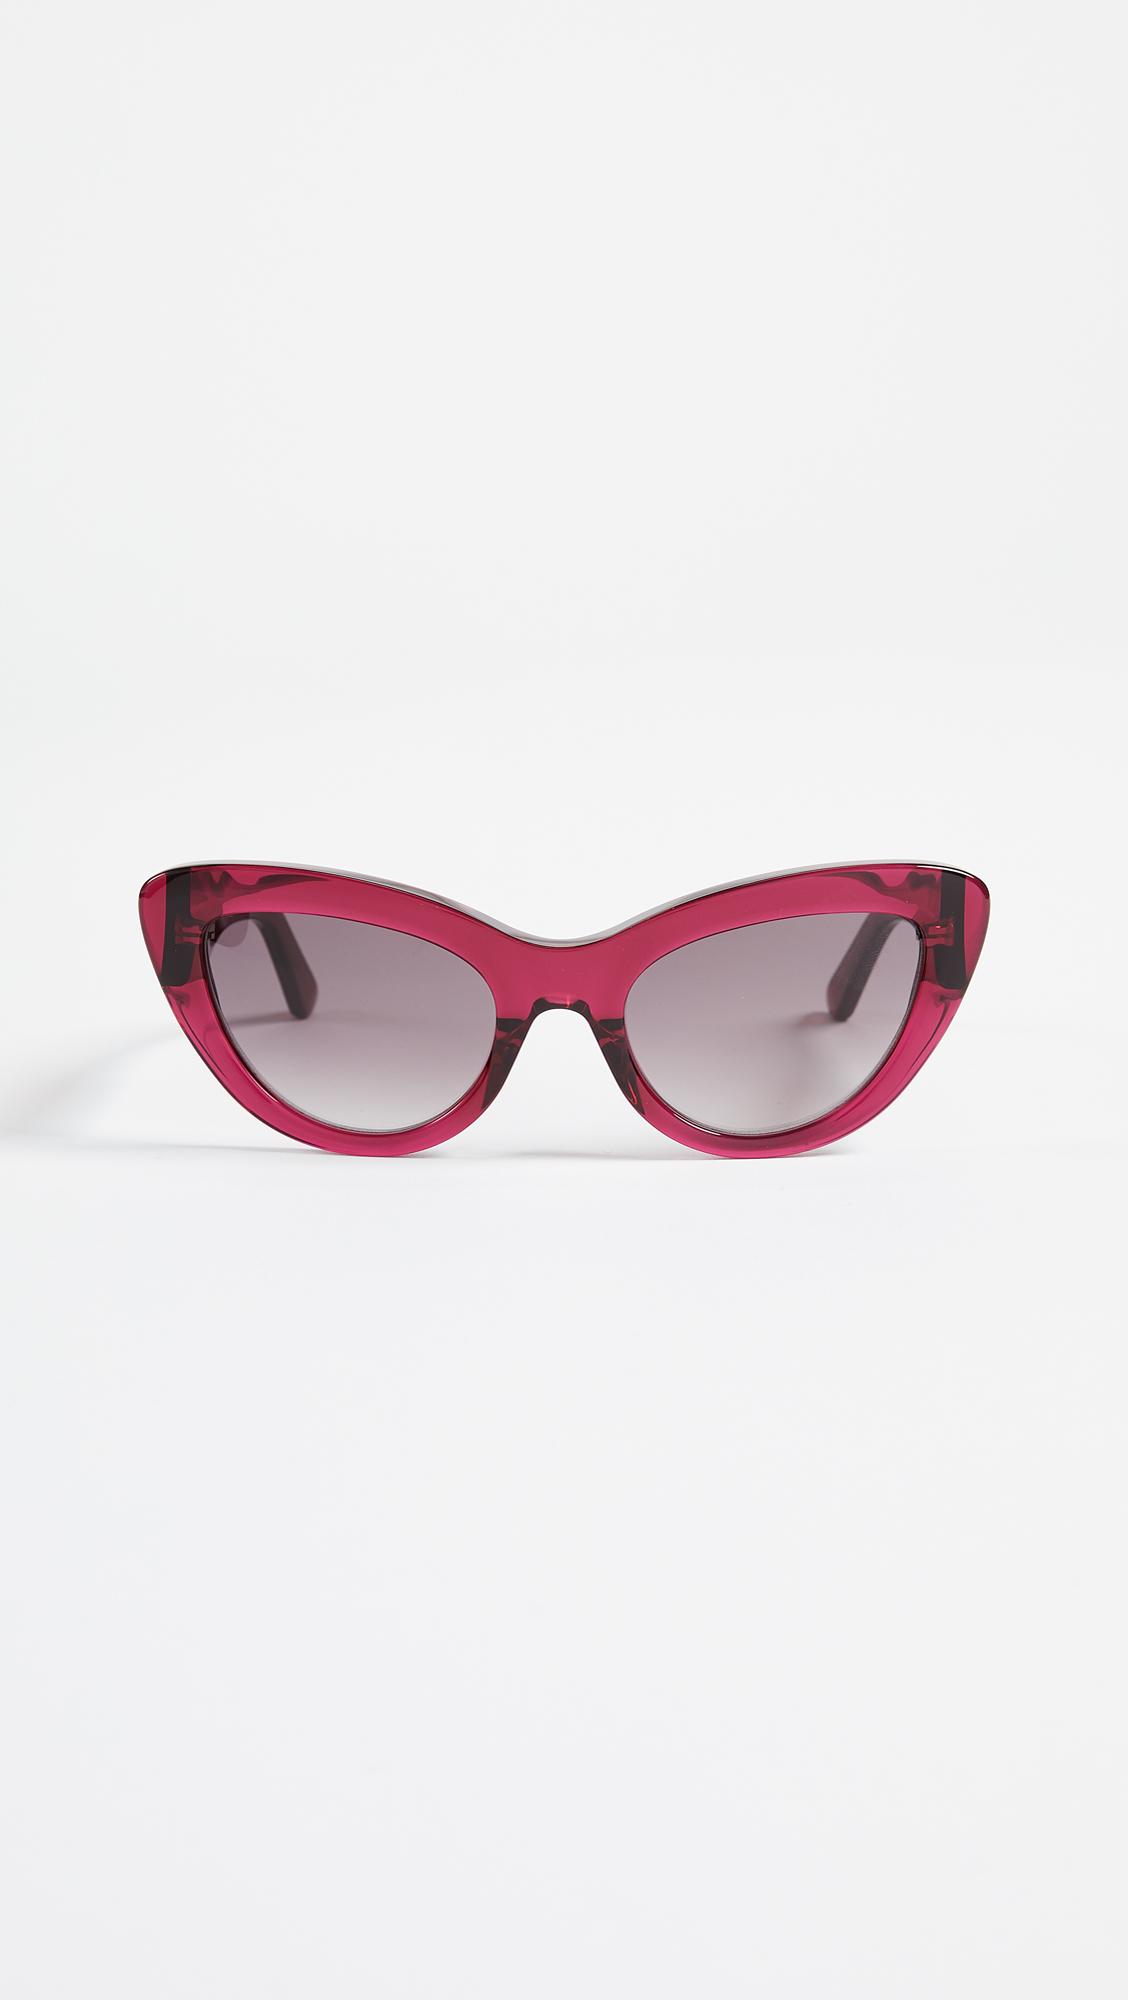 Balenciaga Bold Cat Eye Sunglasses Shopbop Save Up To 25 Use Code Balen Top Pink More18